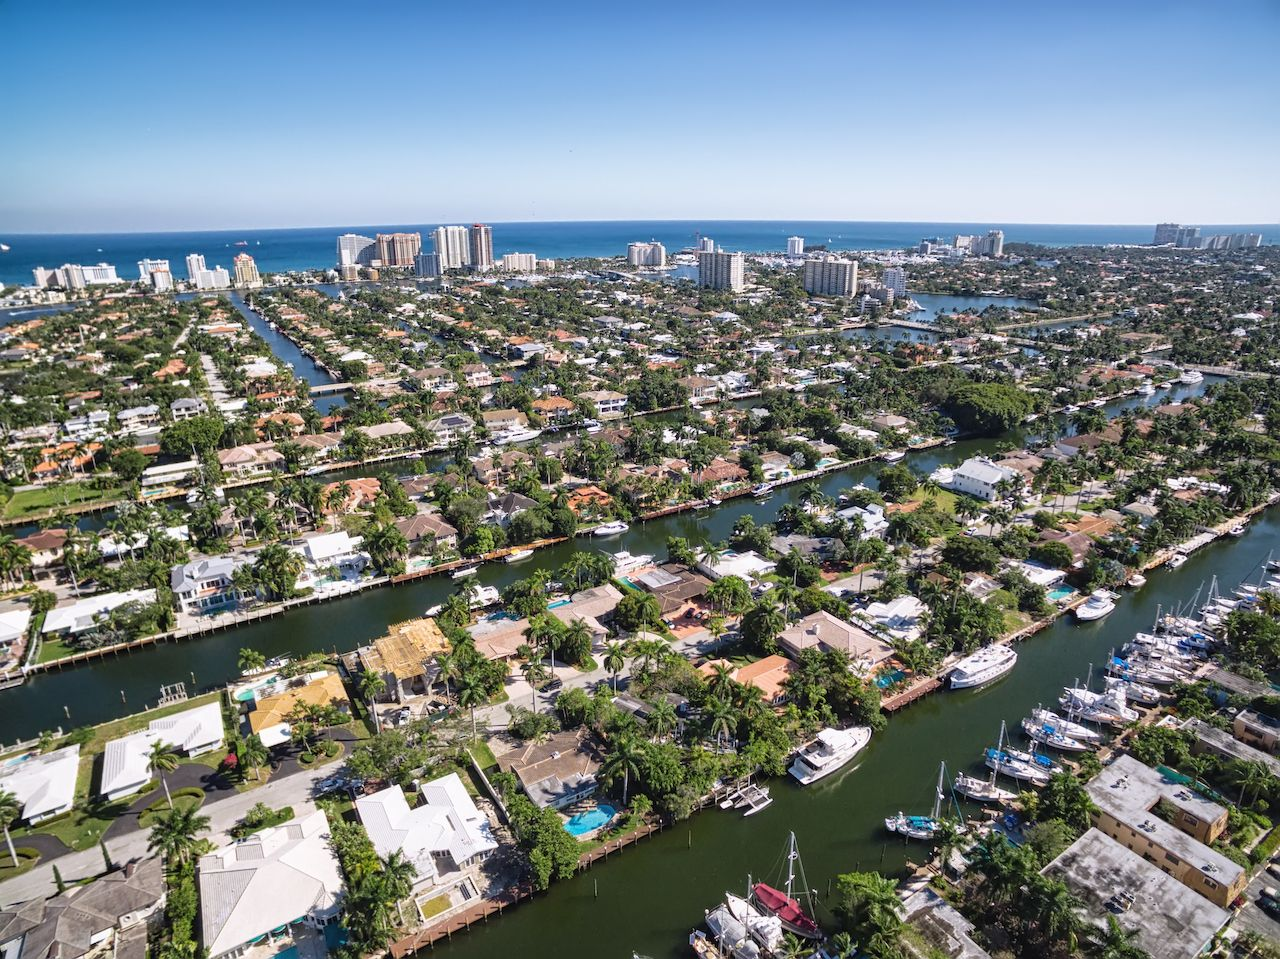 Aerial view of Fort Lauderdale Las Olas Isles, Florida